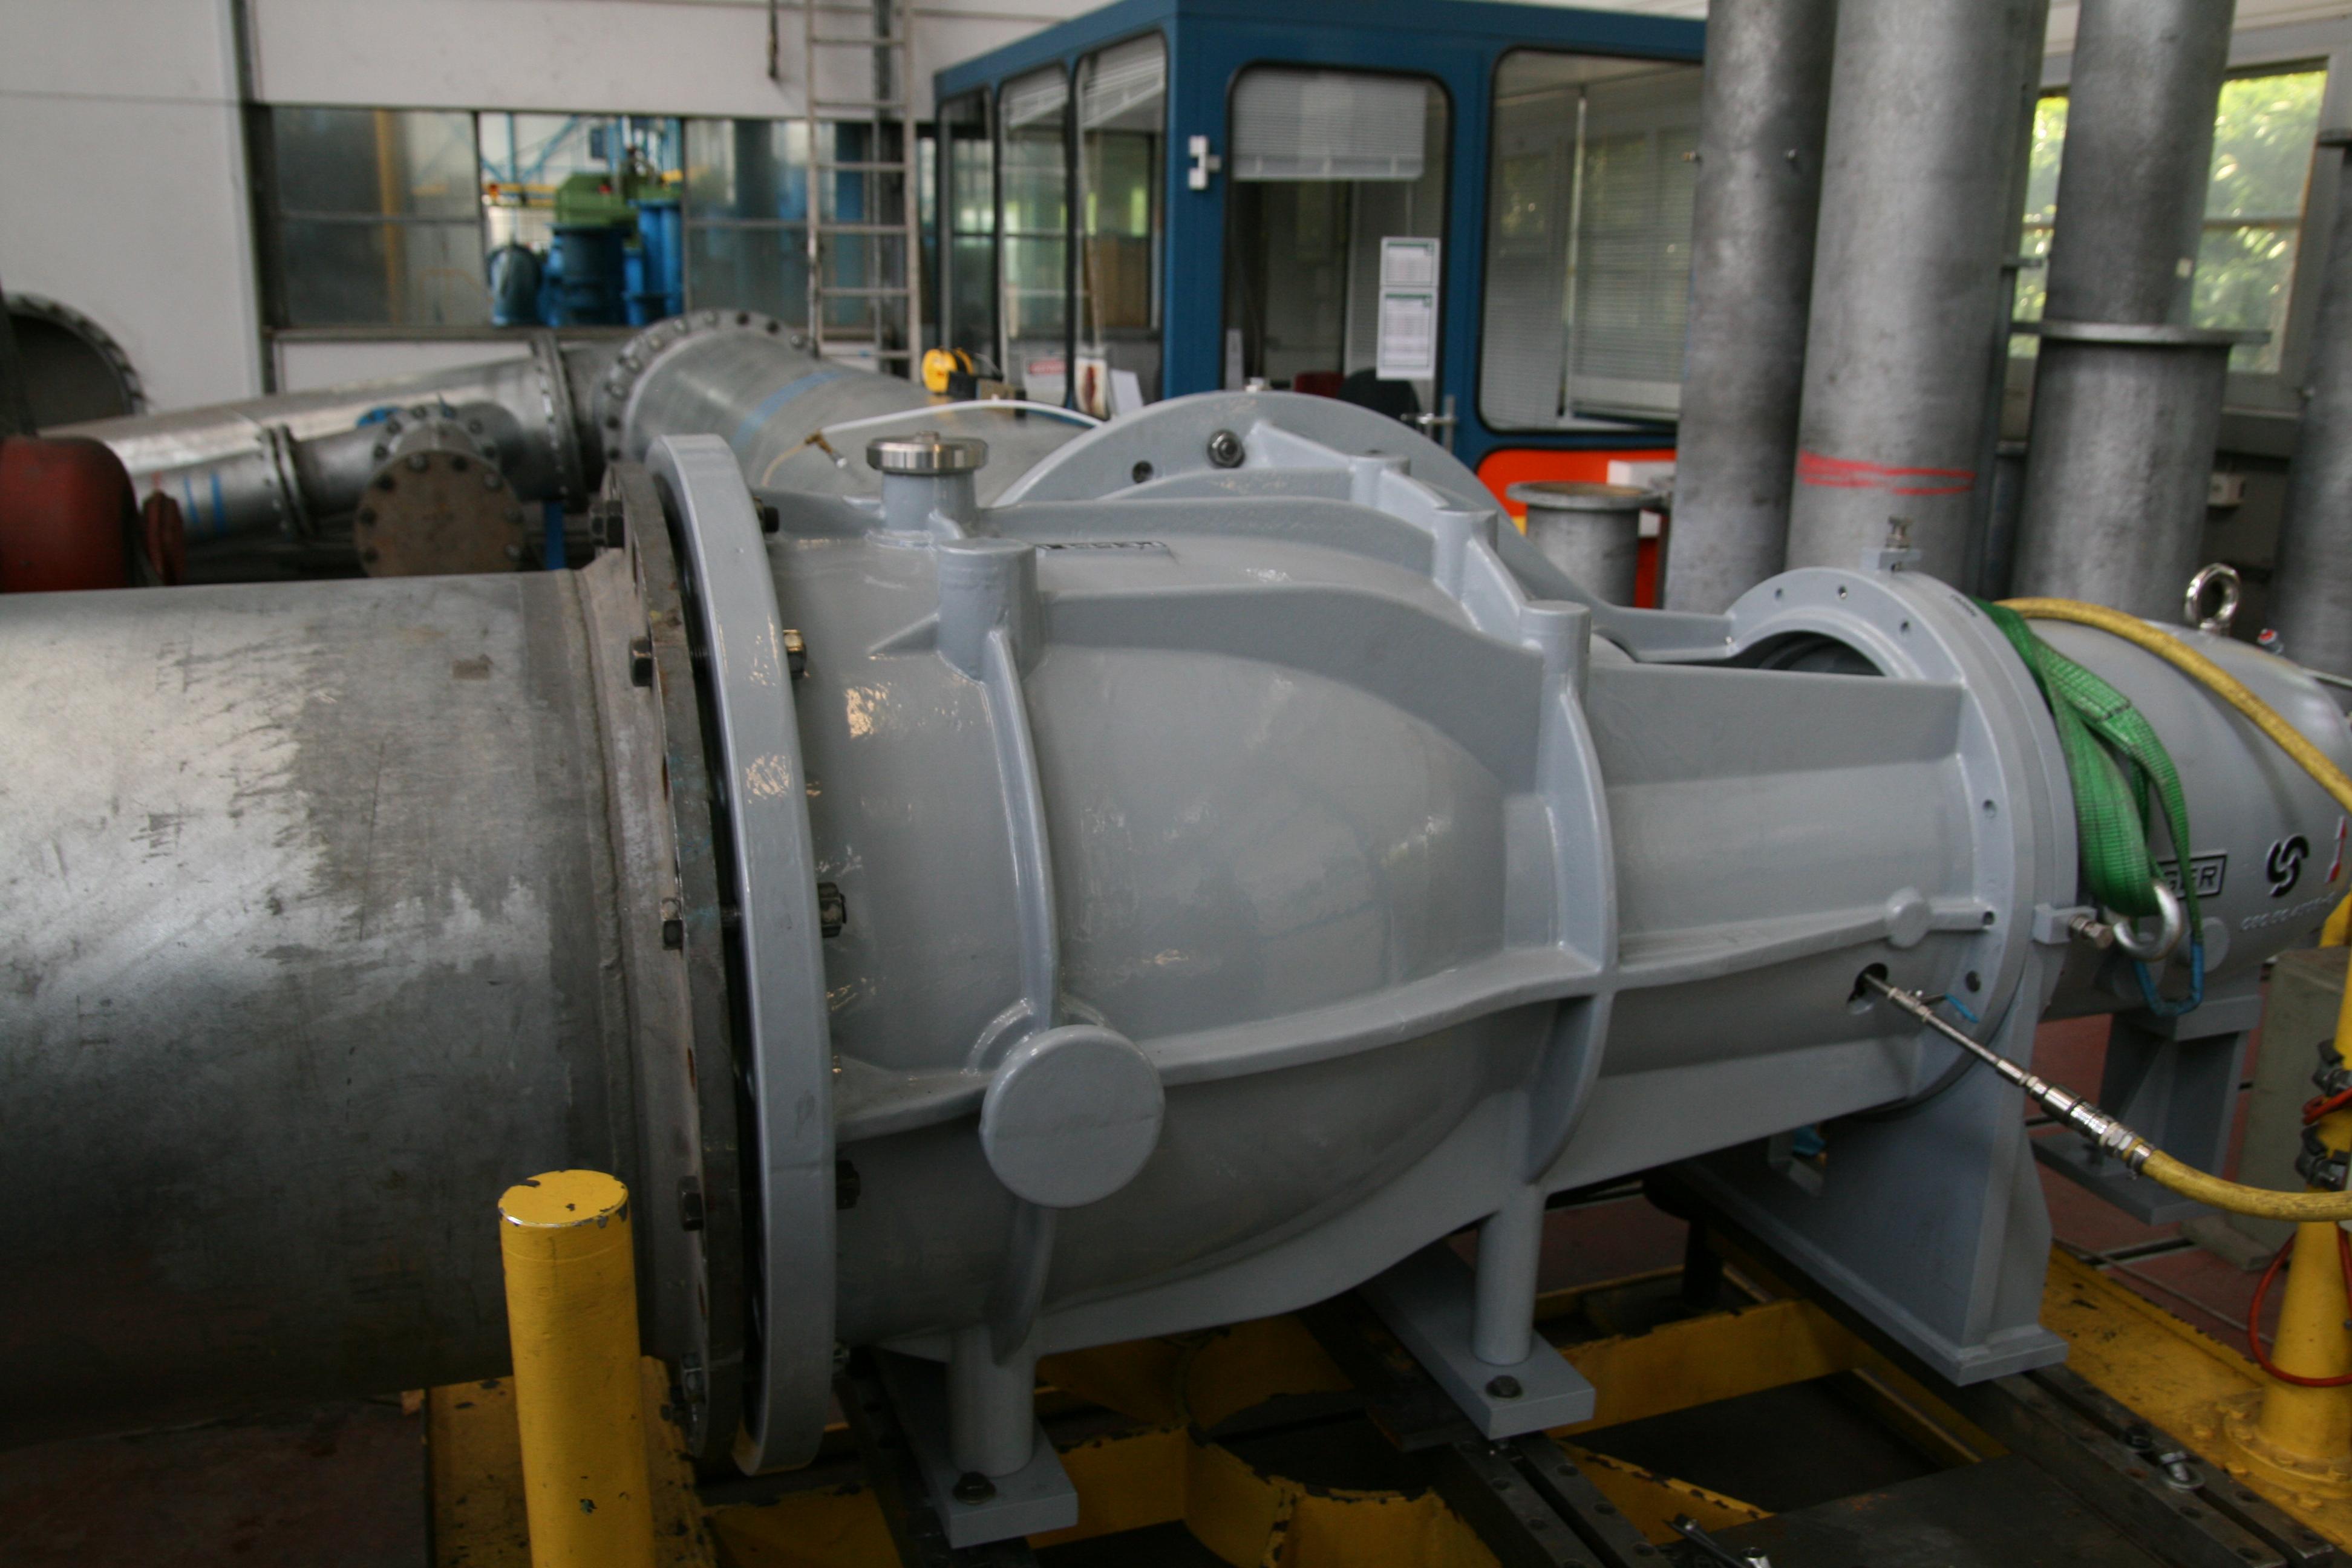 axial pumps for munich sewage treatment plant egger pumps. Black Bedroom Furniture Sets. Home Design Ideas